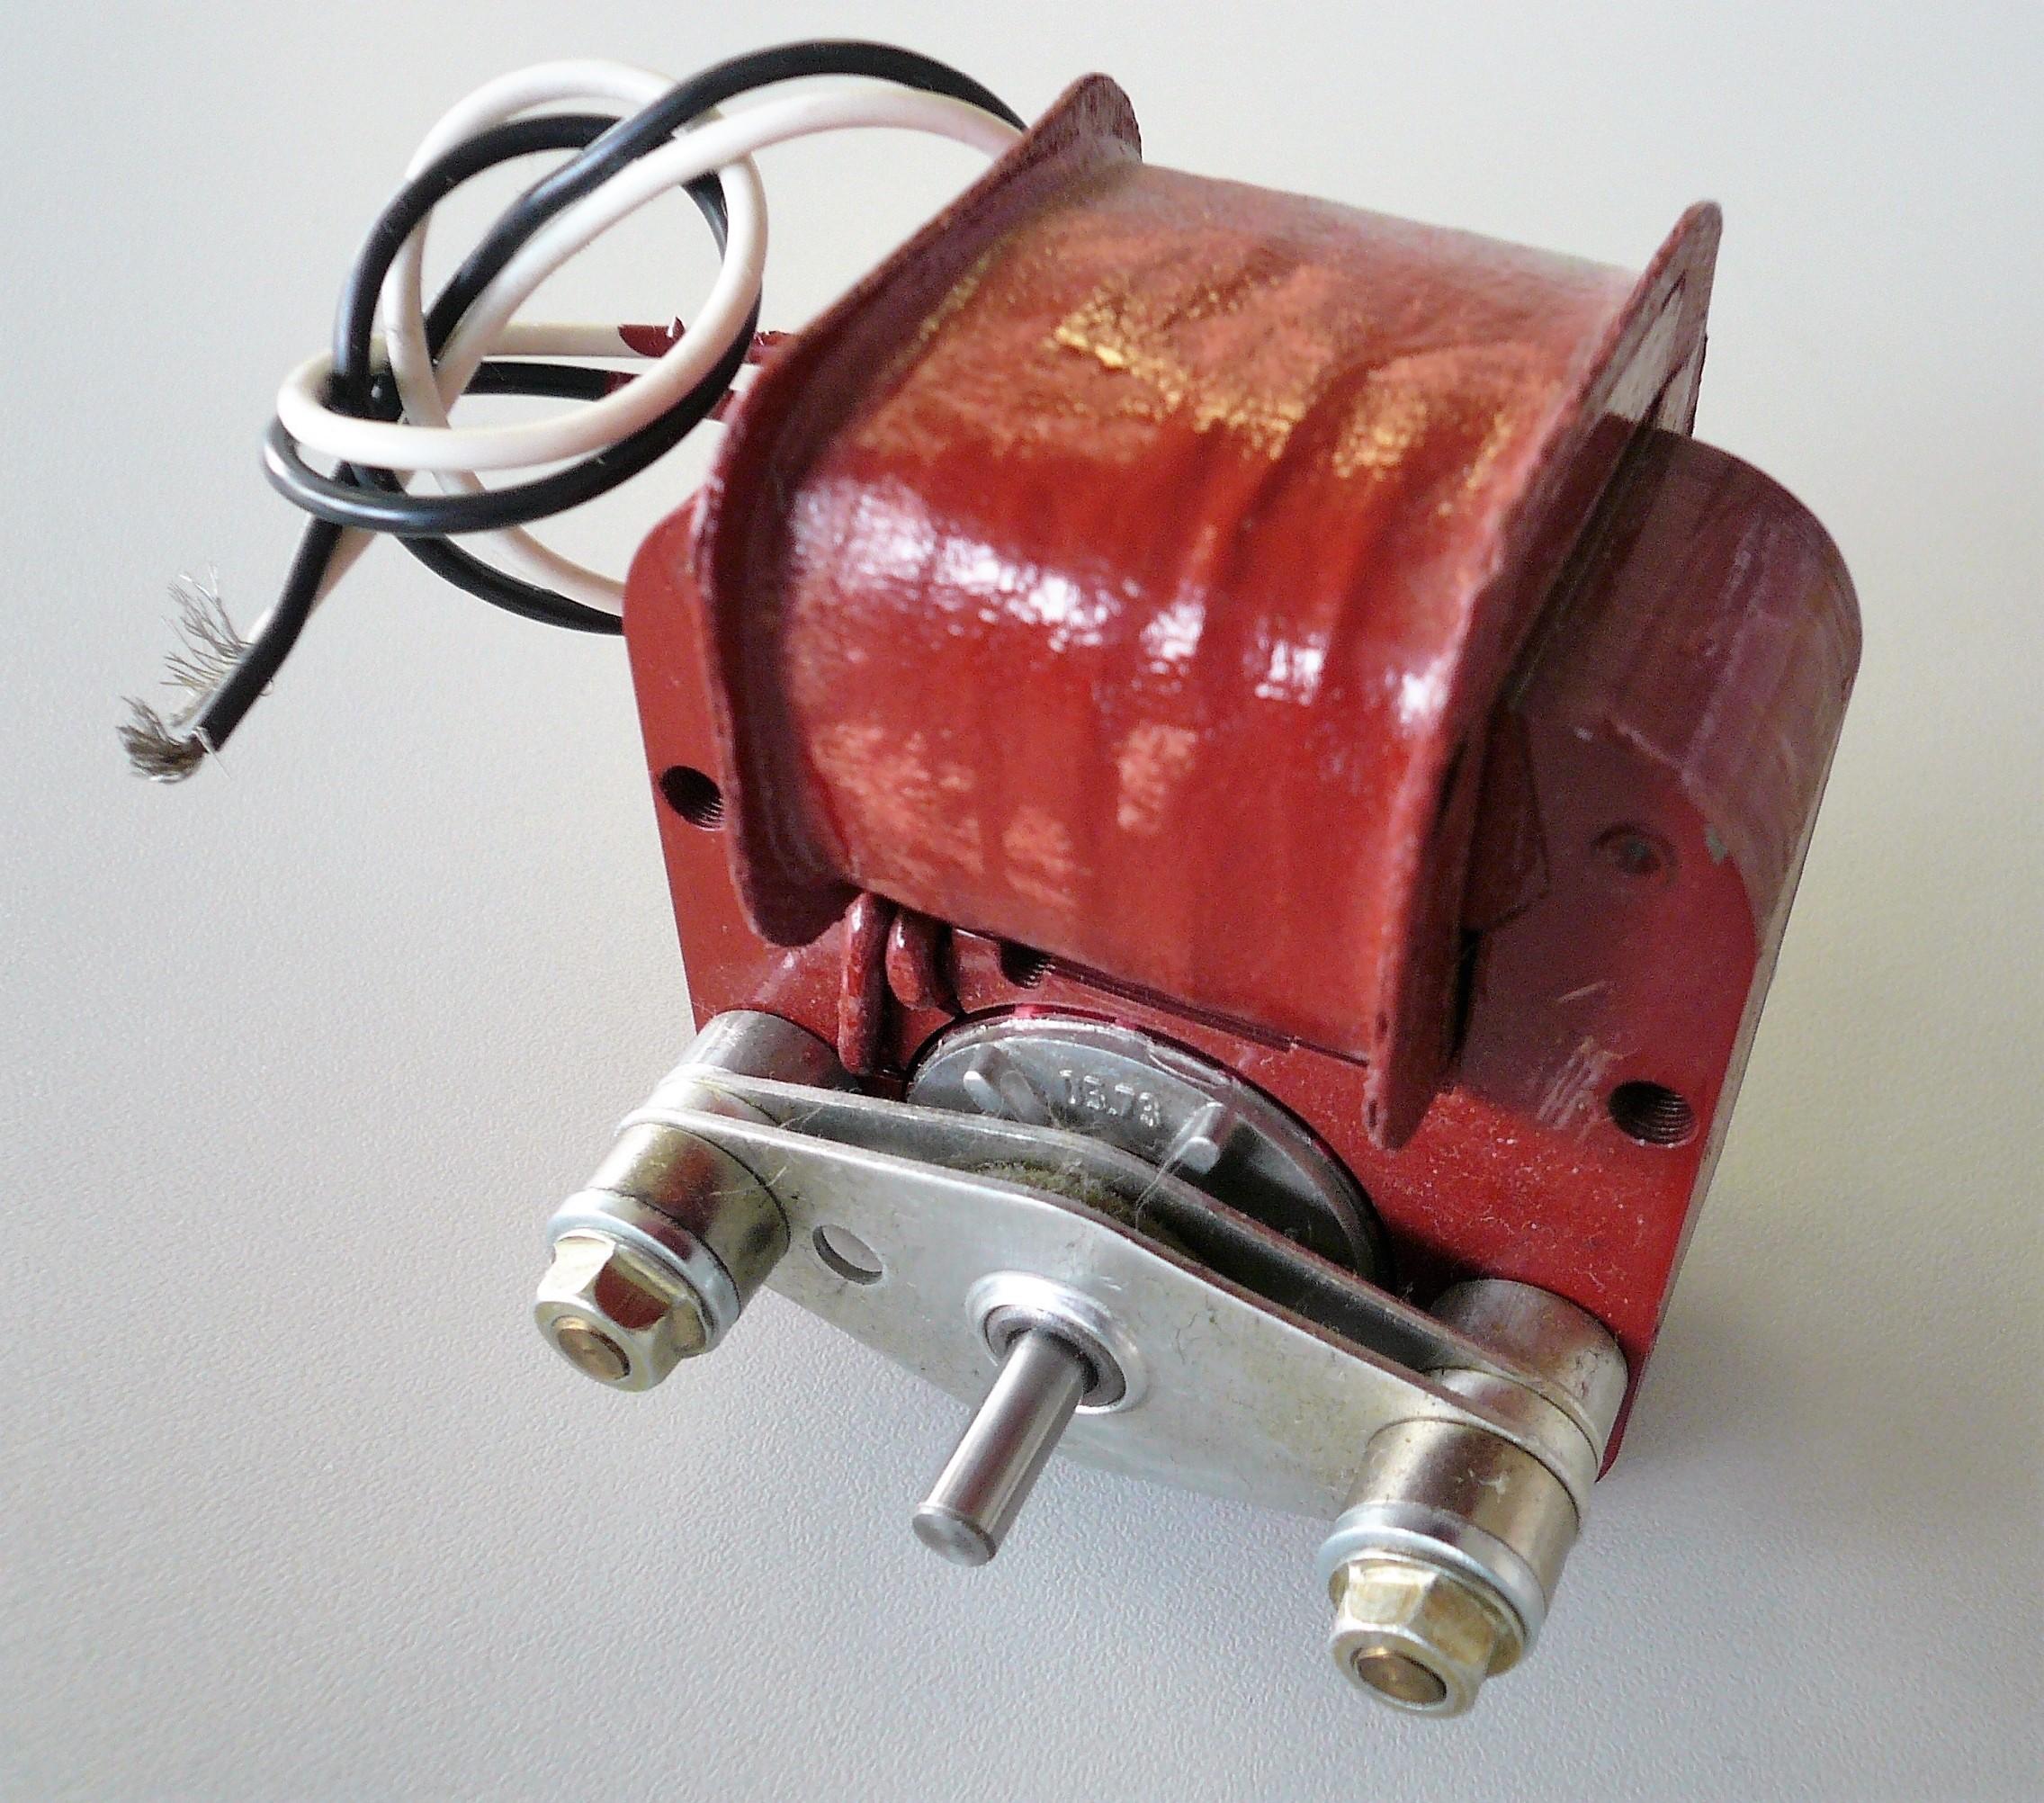 The Shaded-pole motor